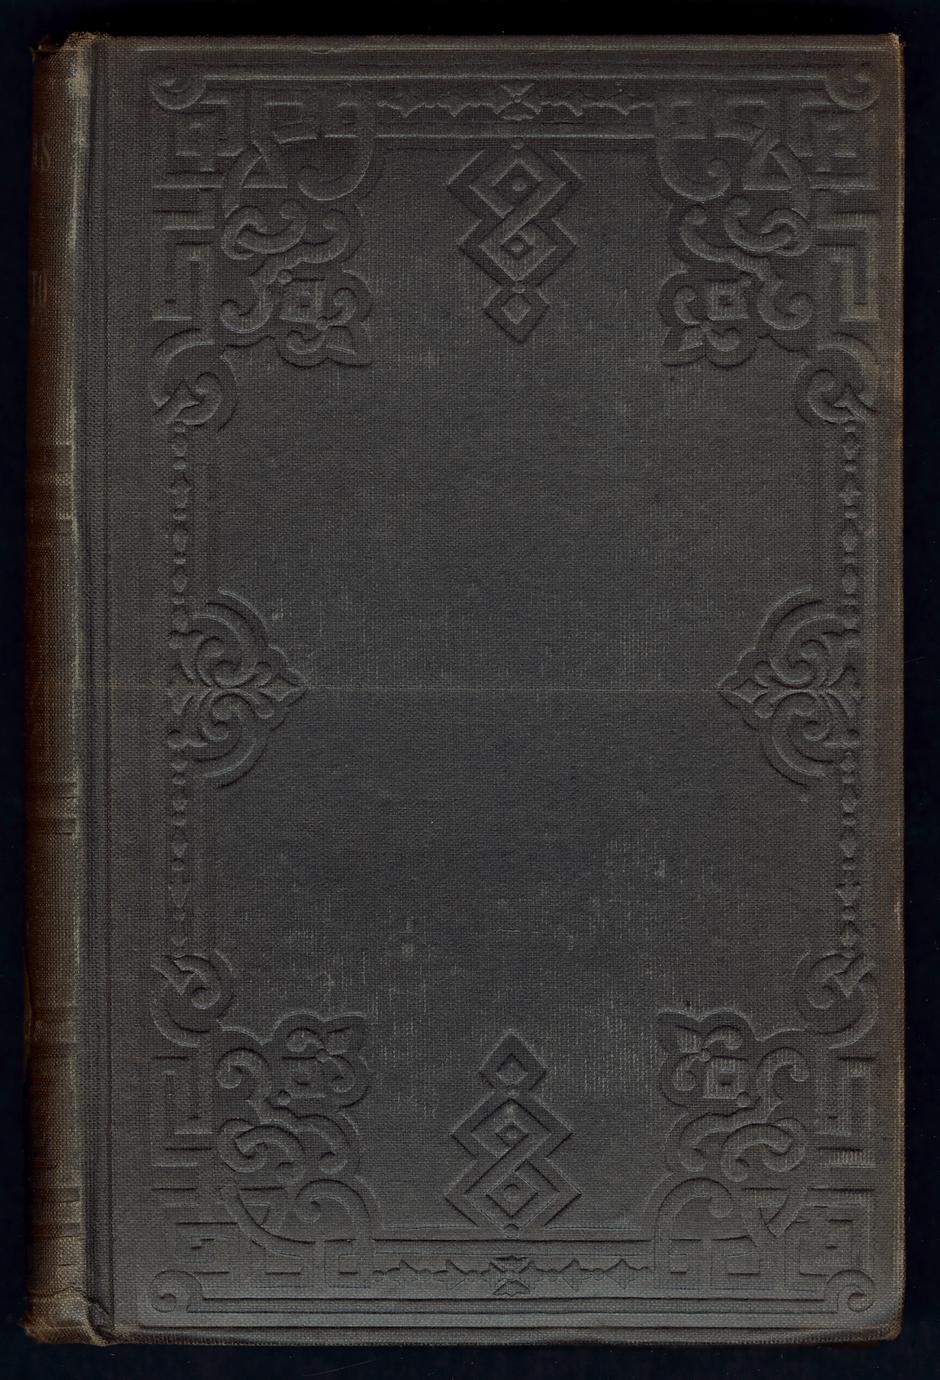 Memoirs of John Kitto (1 of 3)